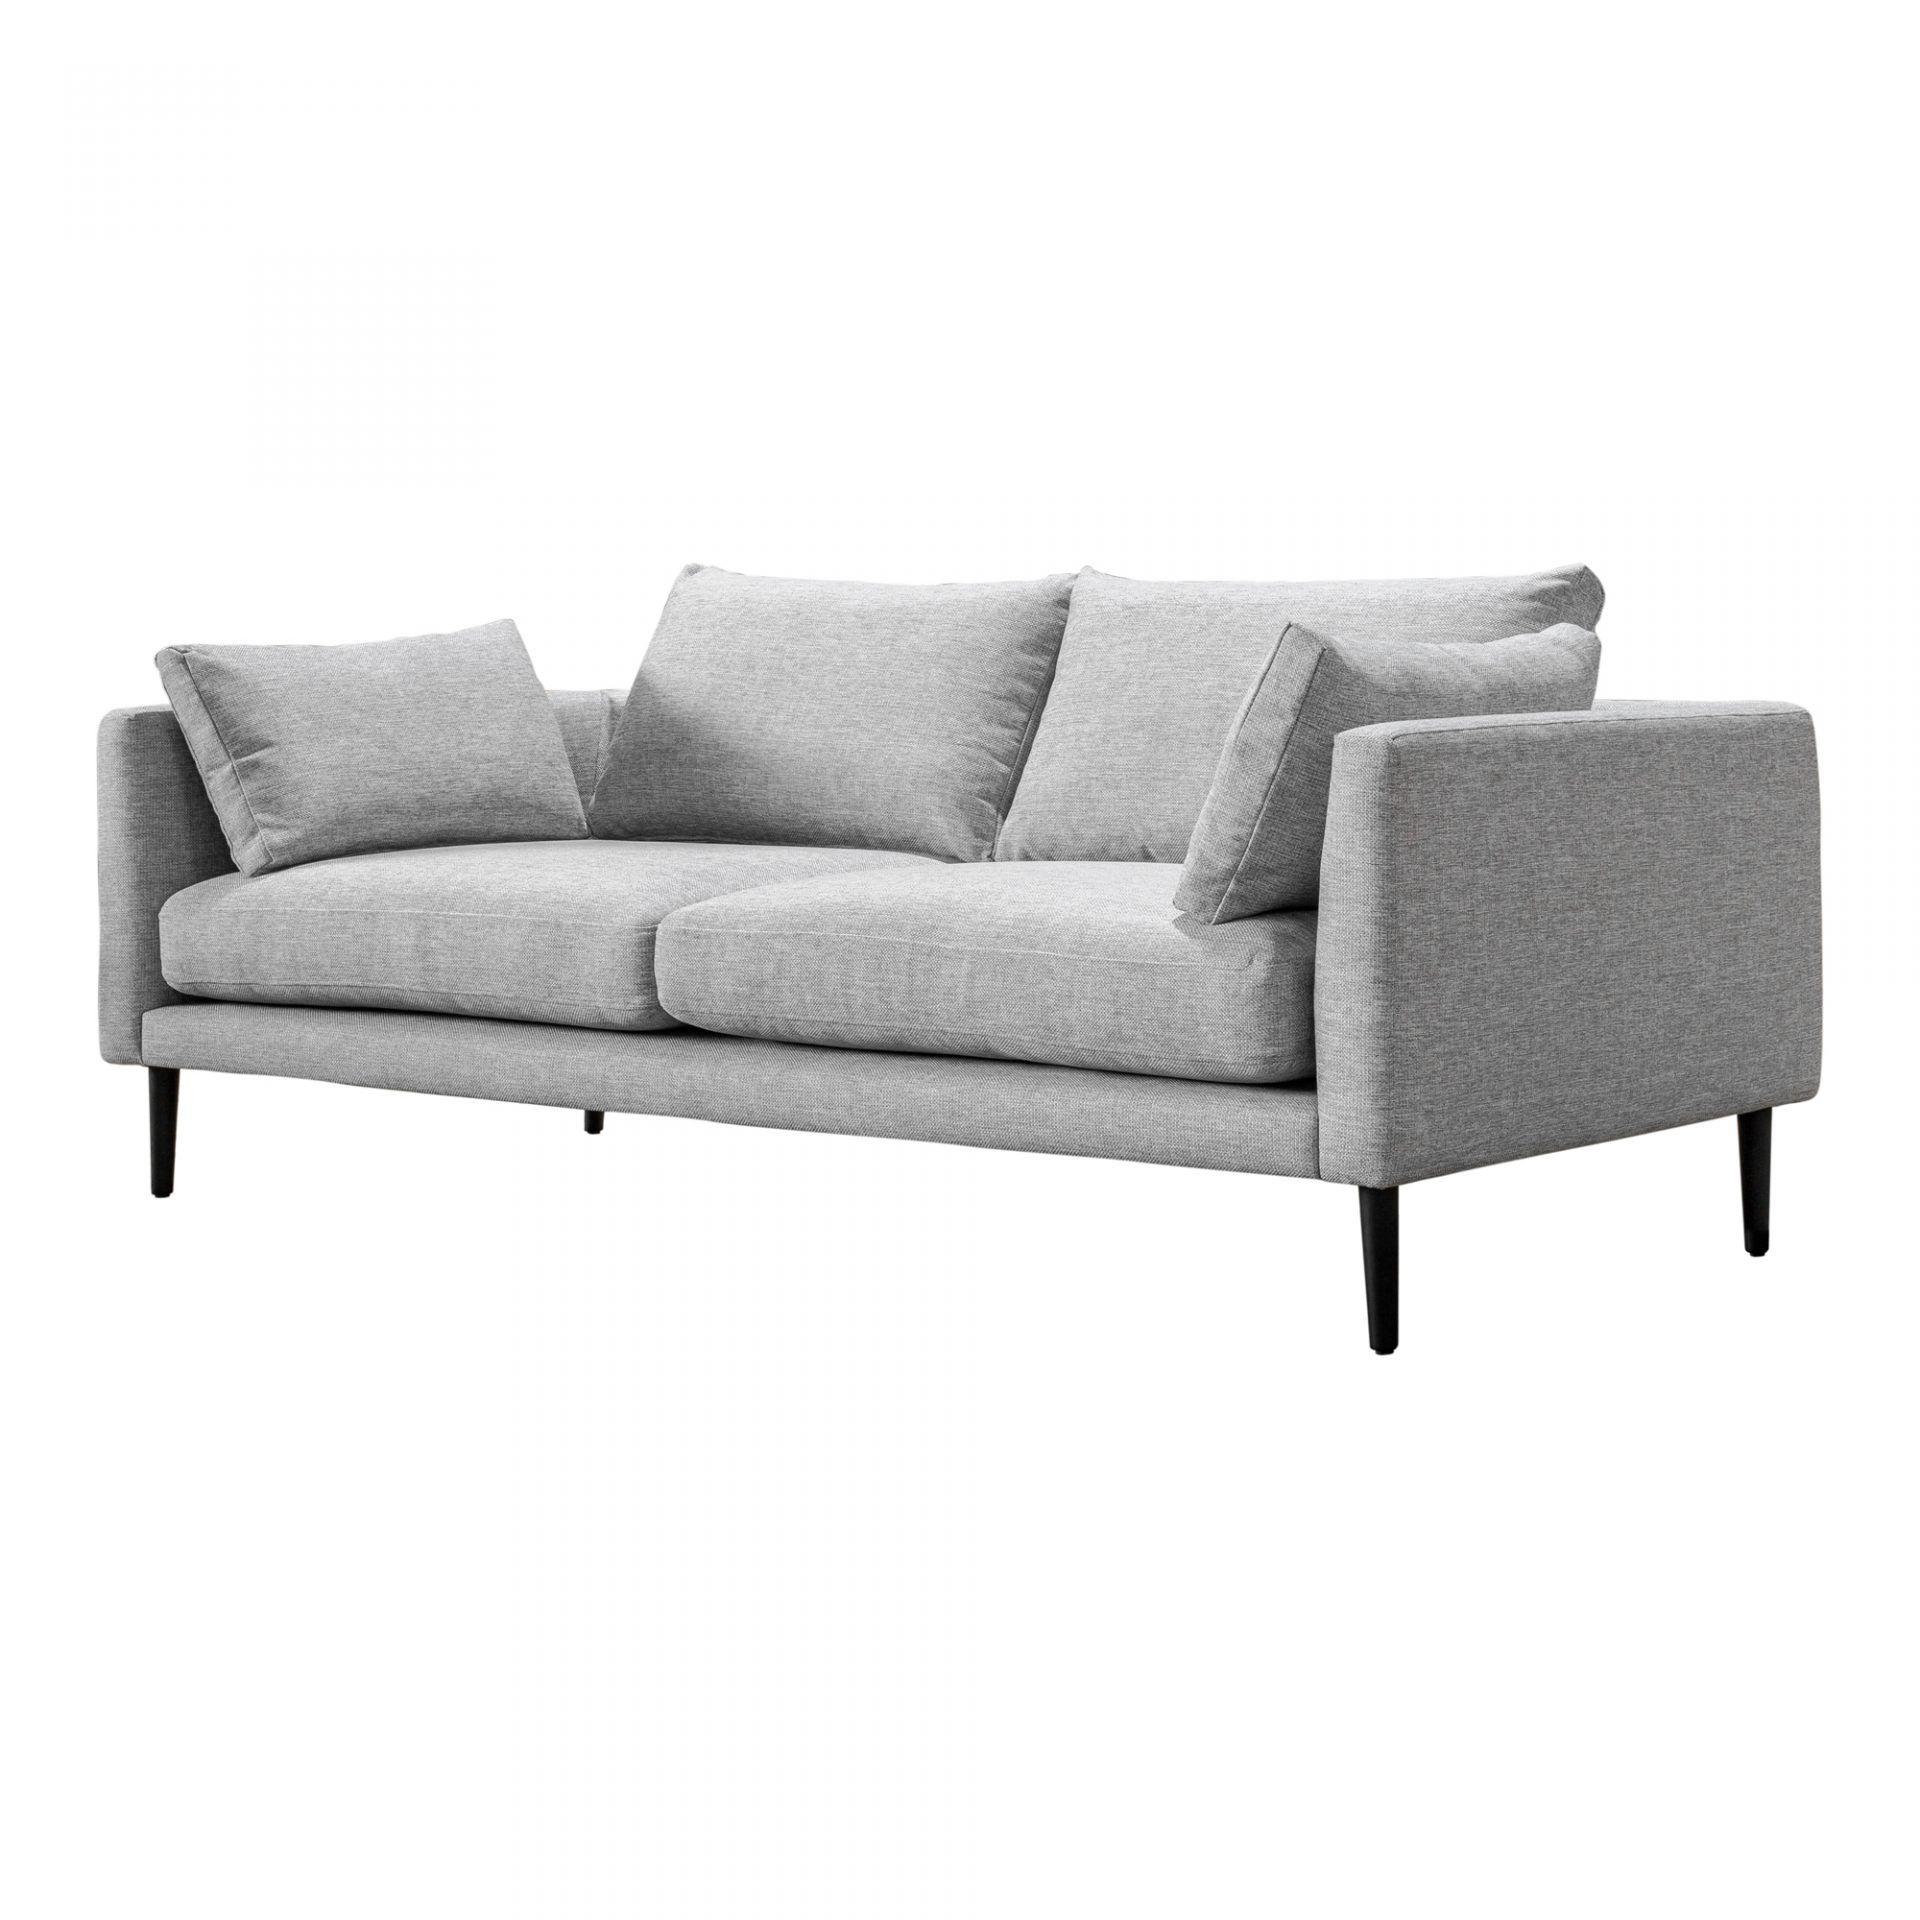 Raval Sofa Light Grey Sofas Moe S Wholesale Modern Grey Sofa Contemporary Modern Sofas Modern Sofa